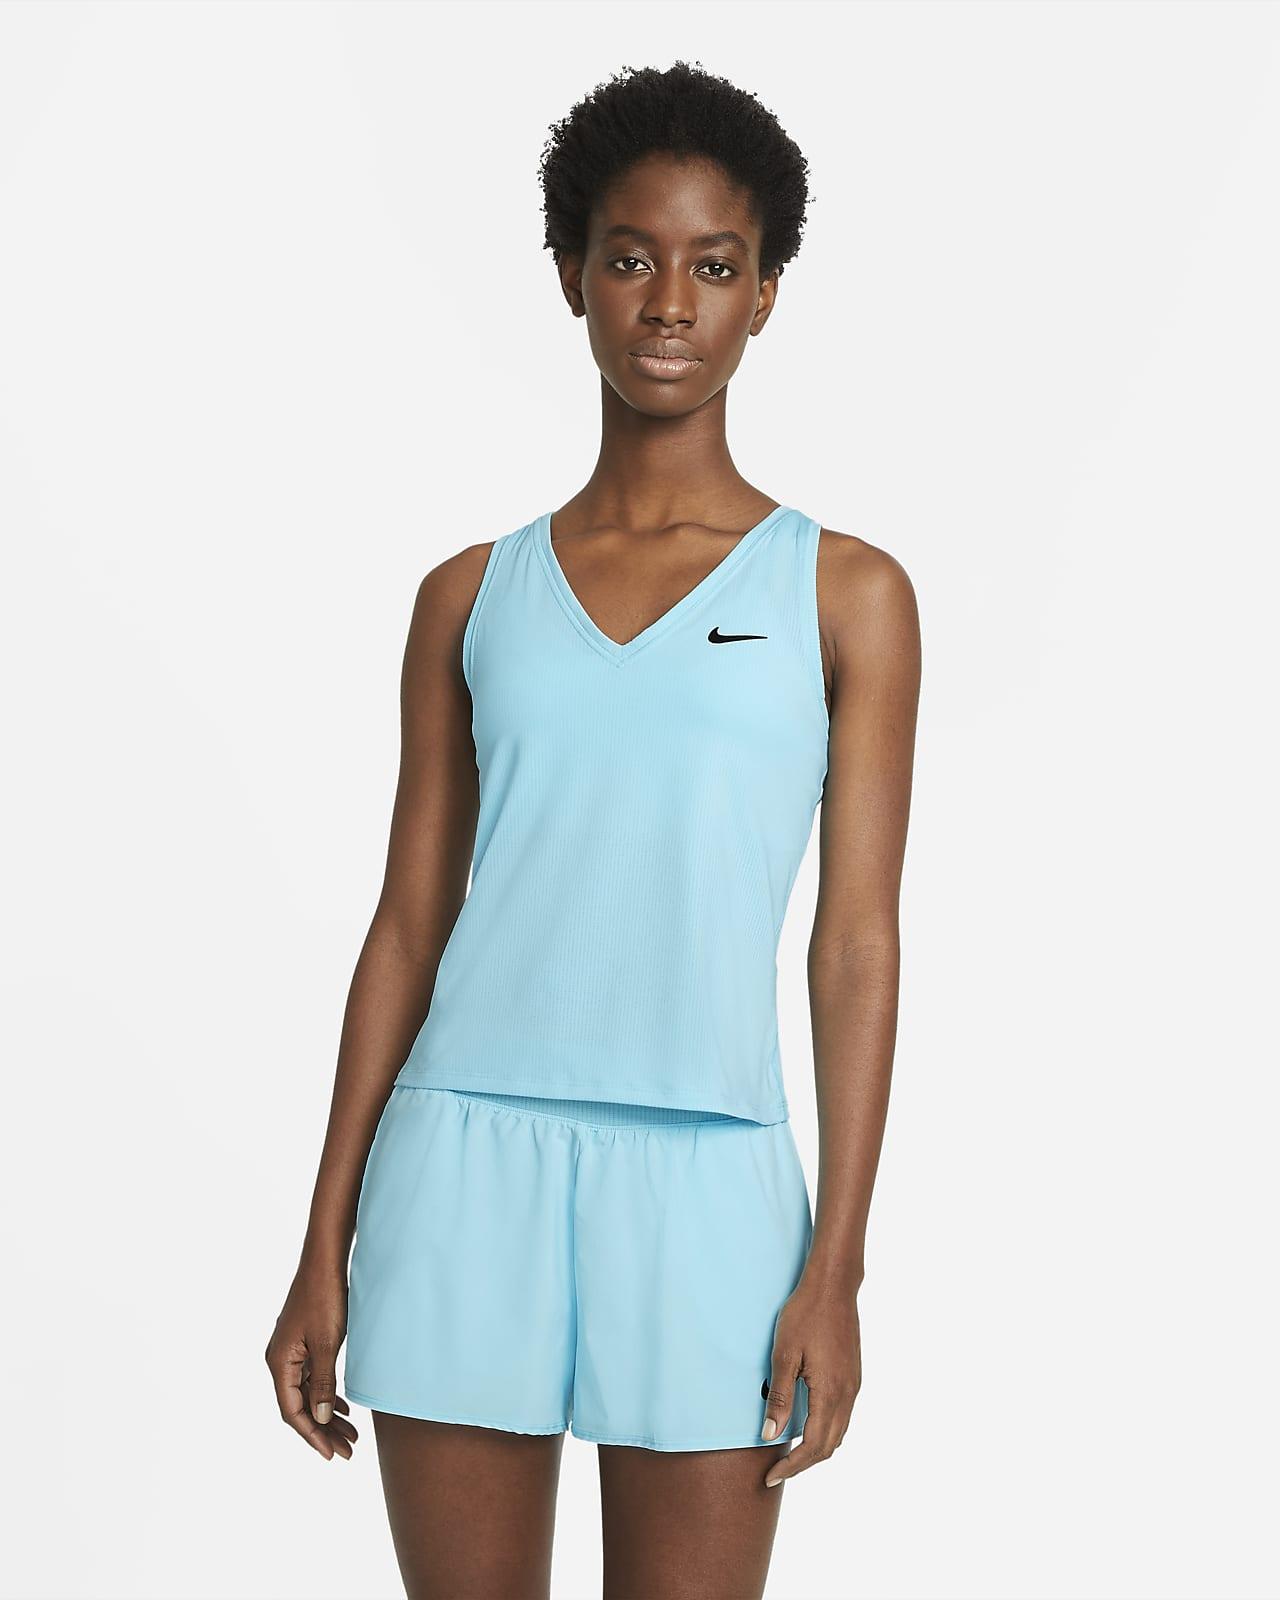 NikeCourt Victory Women's Tennis Tank